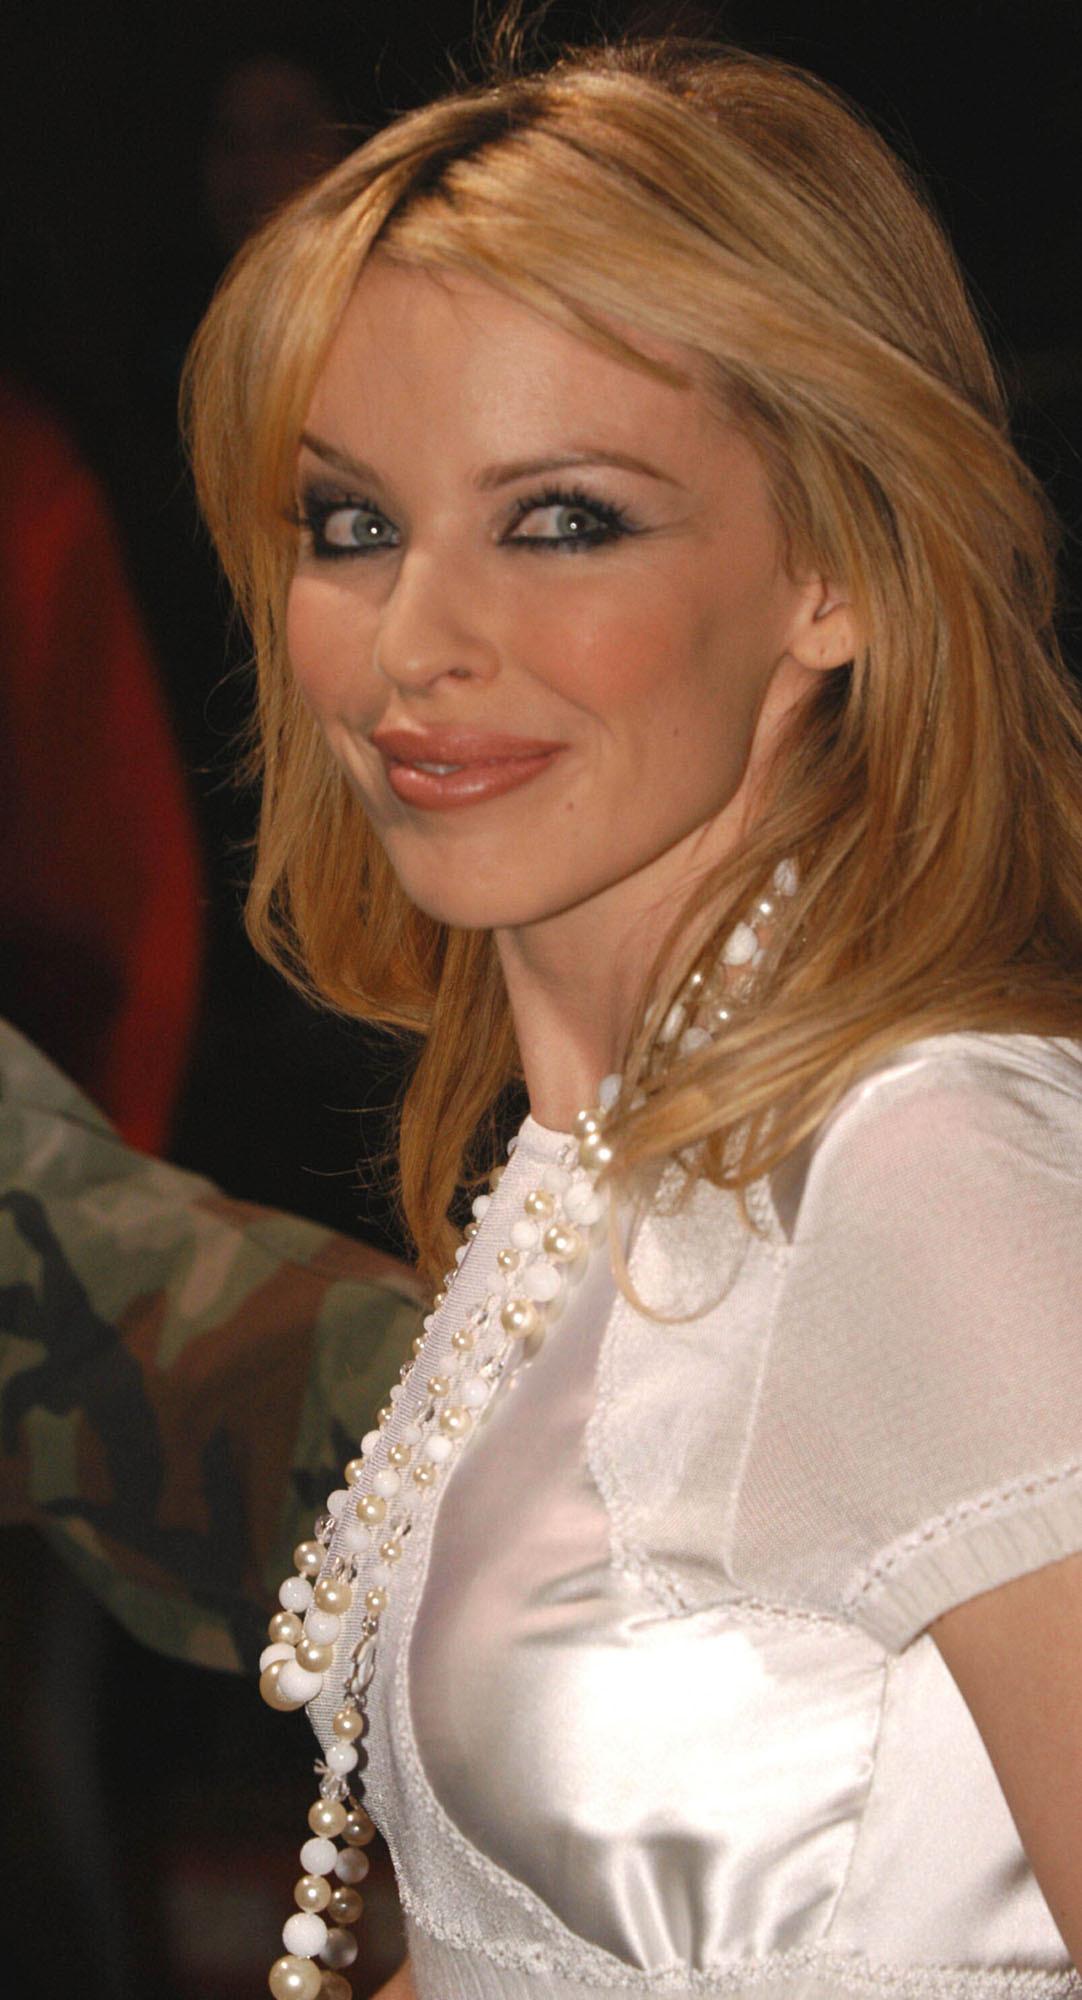 Kylie Minogue 2000 Minogue kylie ann minogue